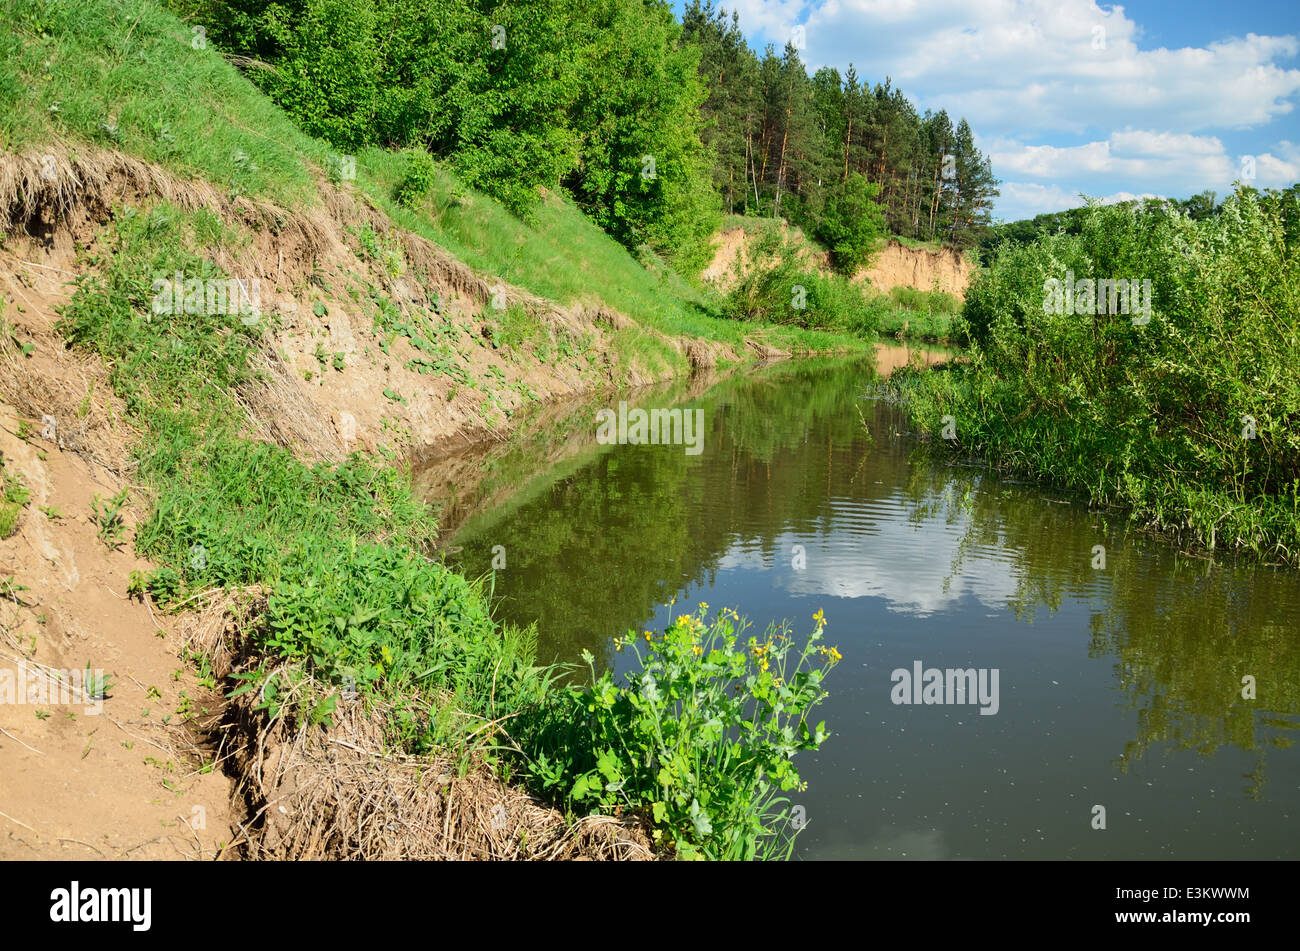 Steep coast of the twisting river - Stock Image